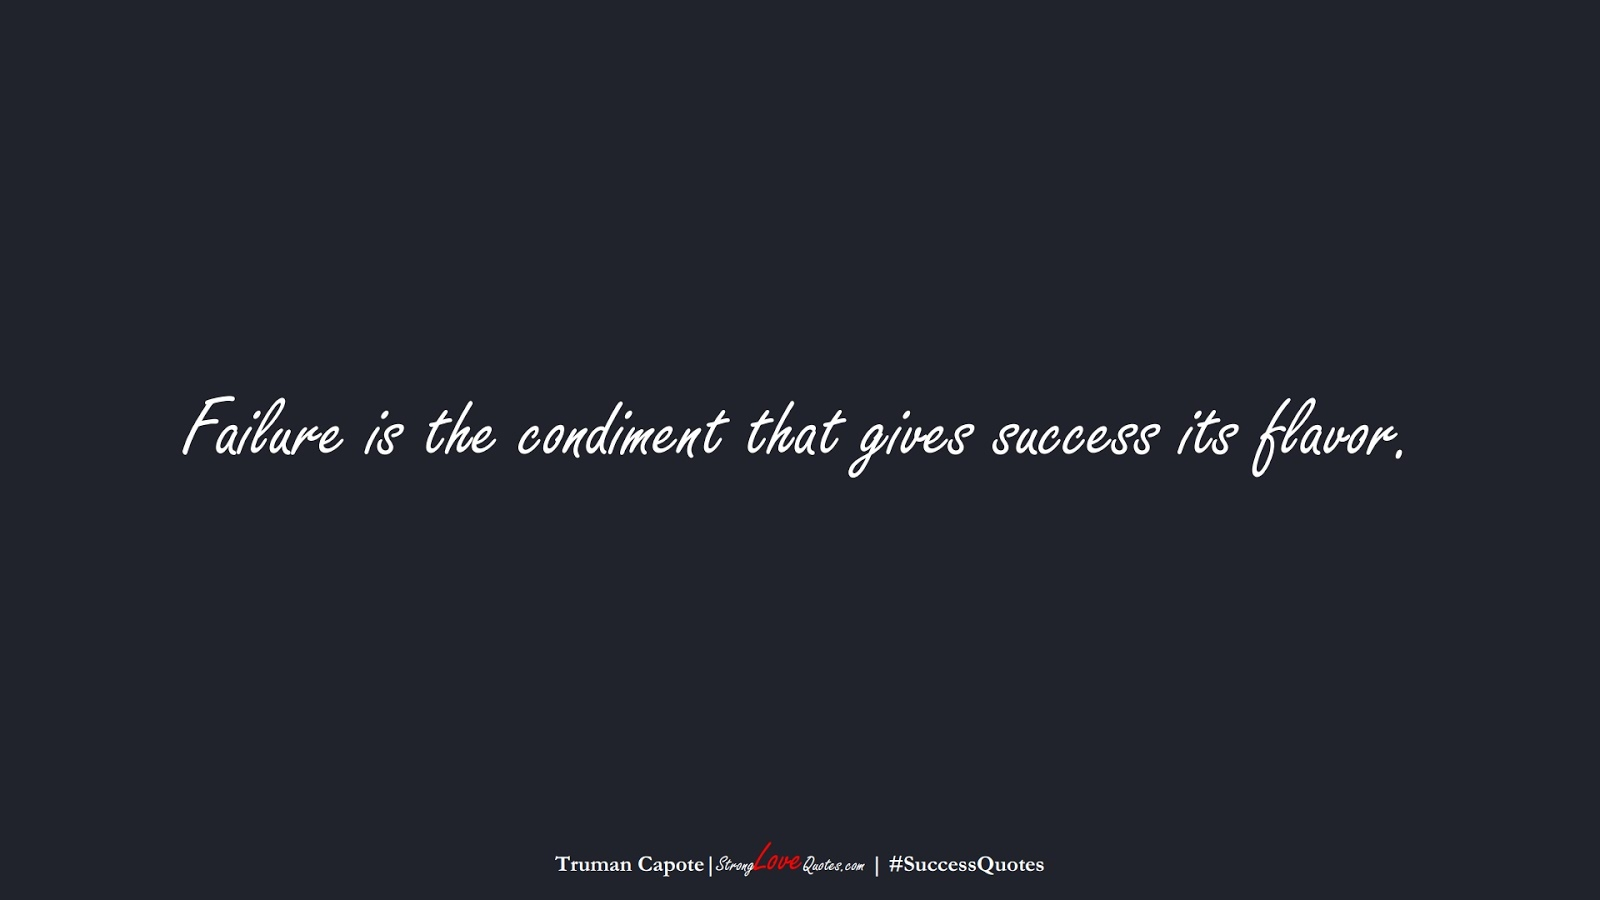 Failure is the condiment that gives success its flavor. (Truman Capote);  #SuccessQuotes